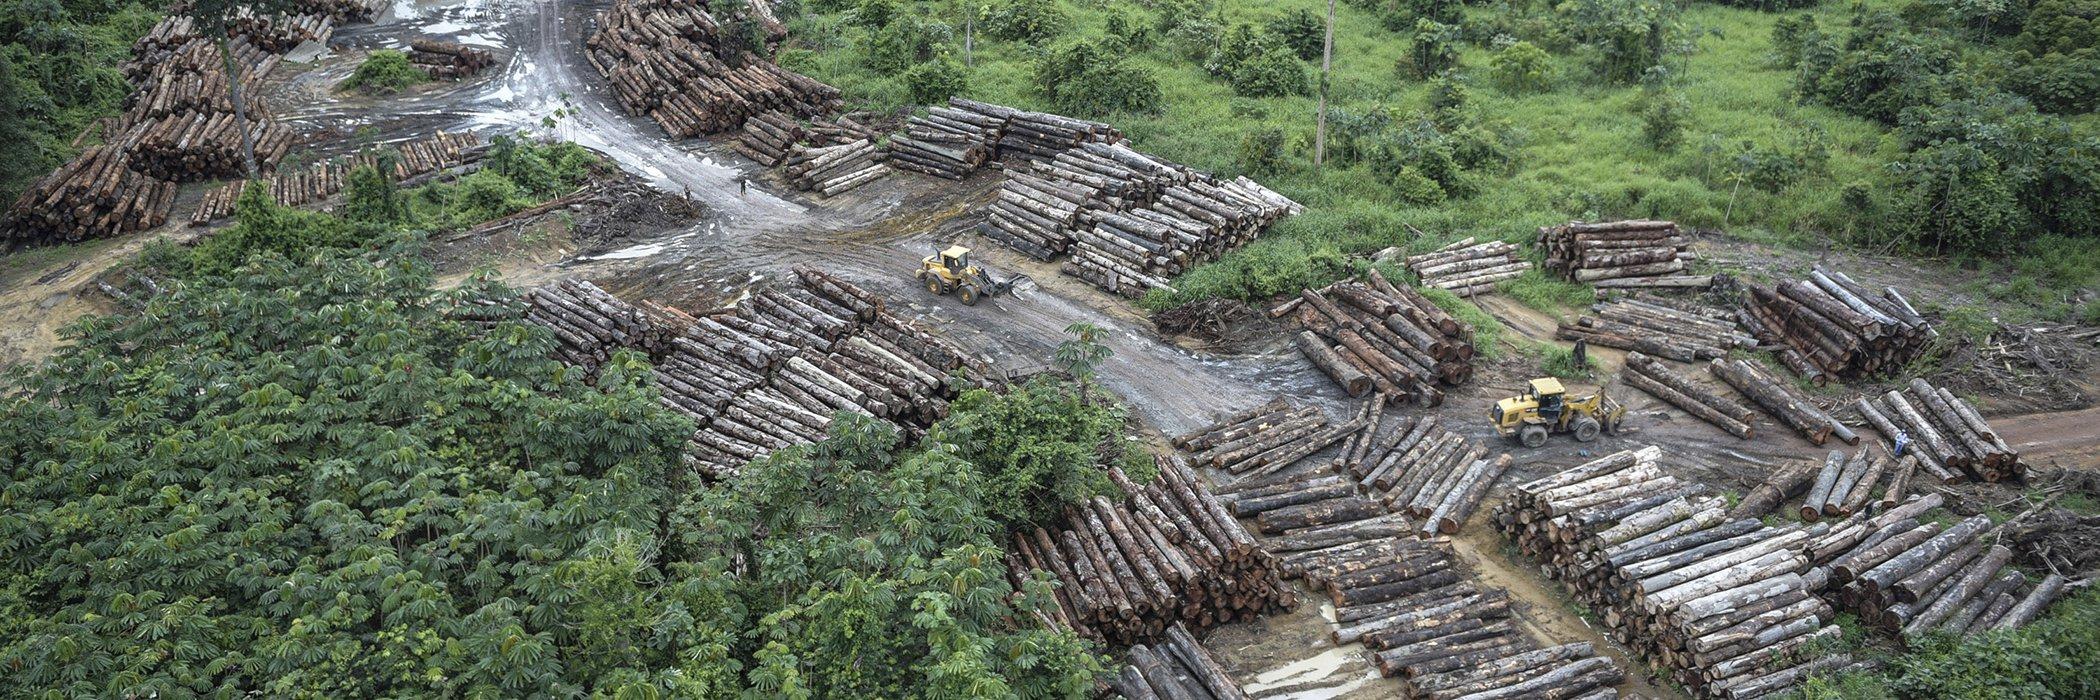 Brazil-Deforestation-Jair Bolsonaro-Environment.jpg